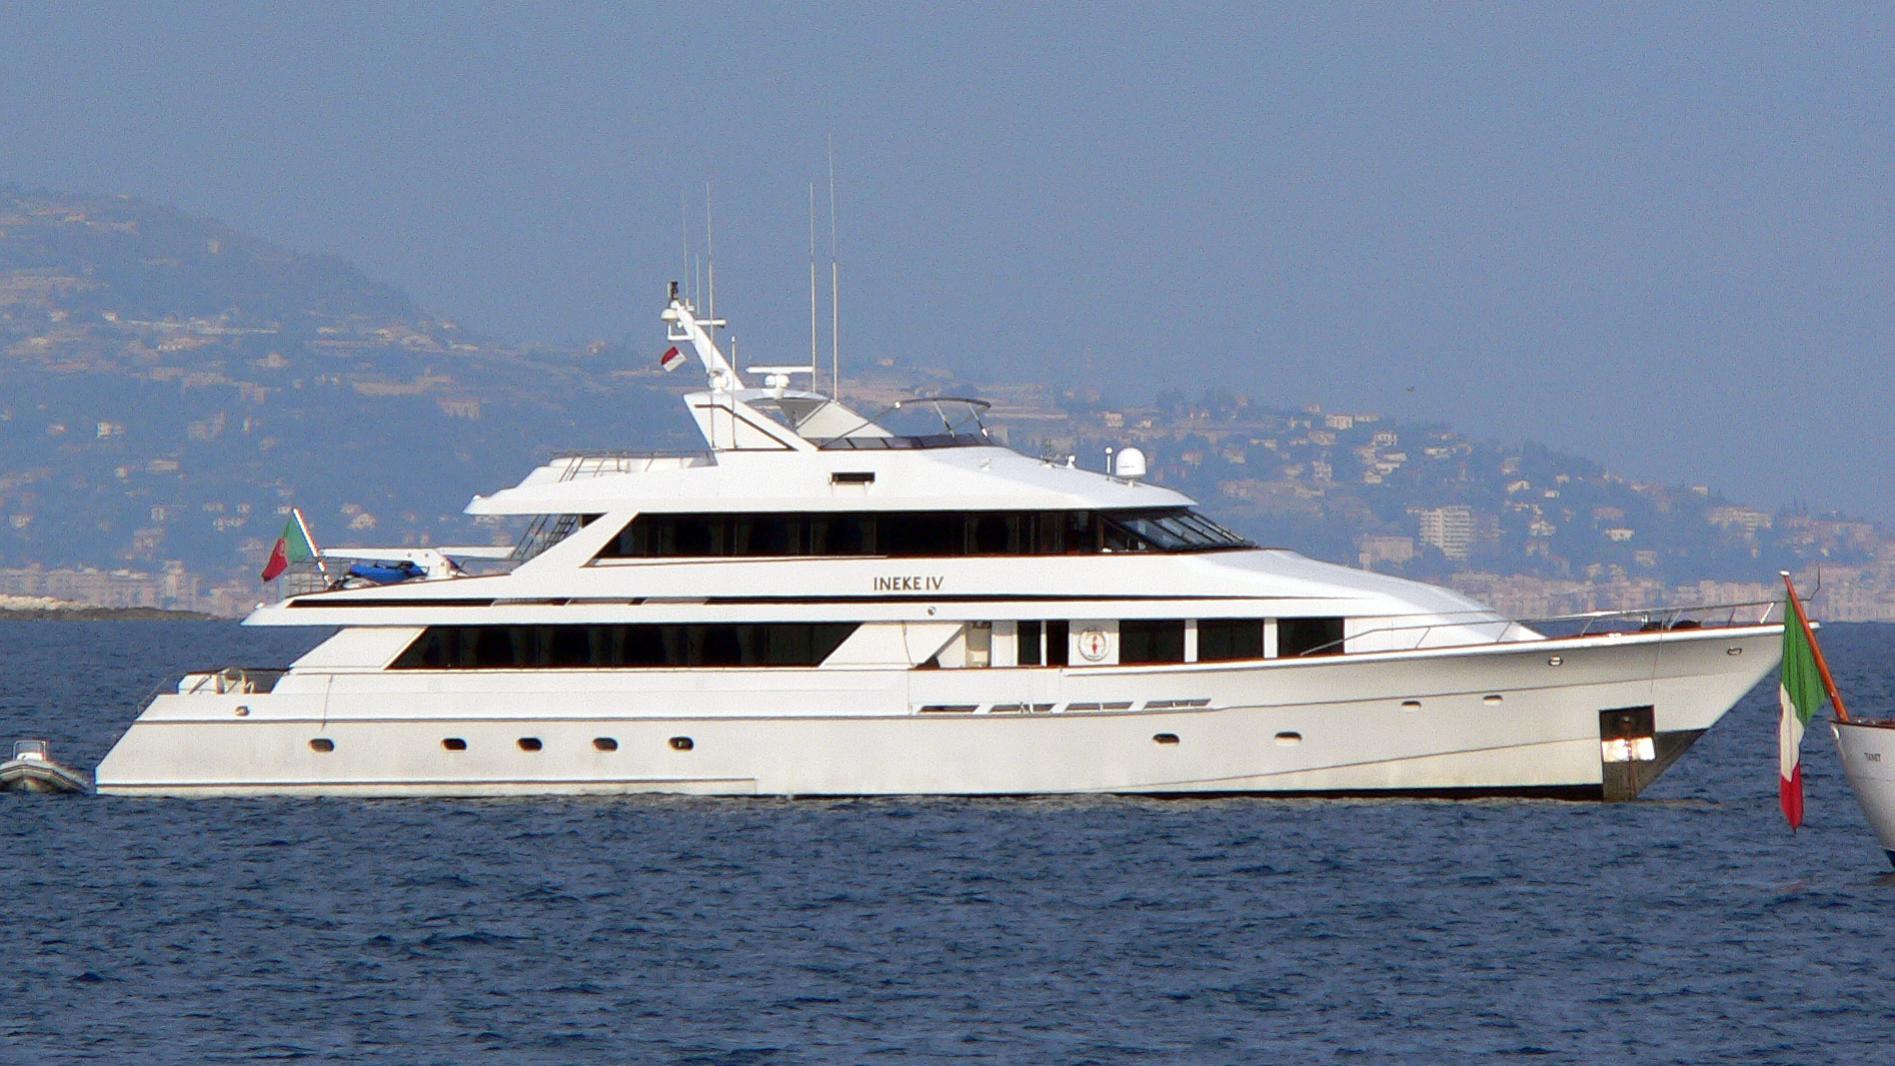 ineke-iv-yacht-exterior